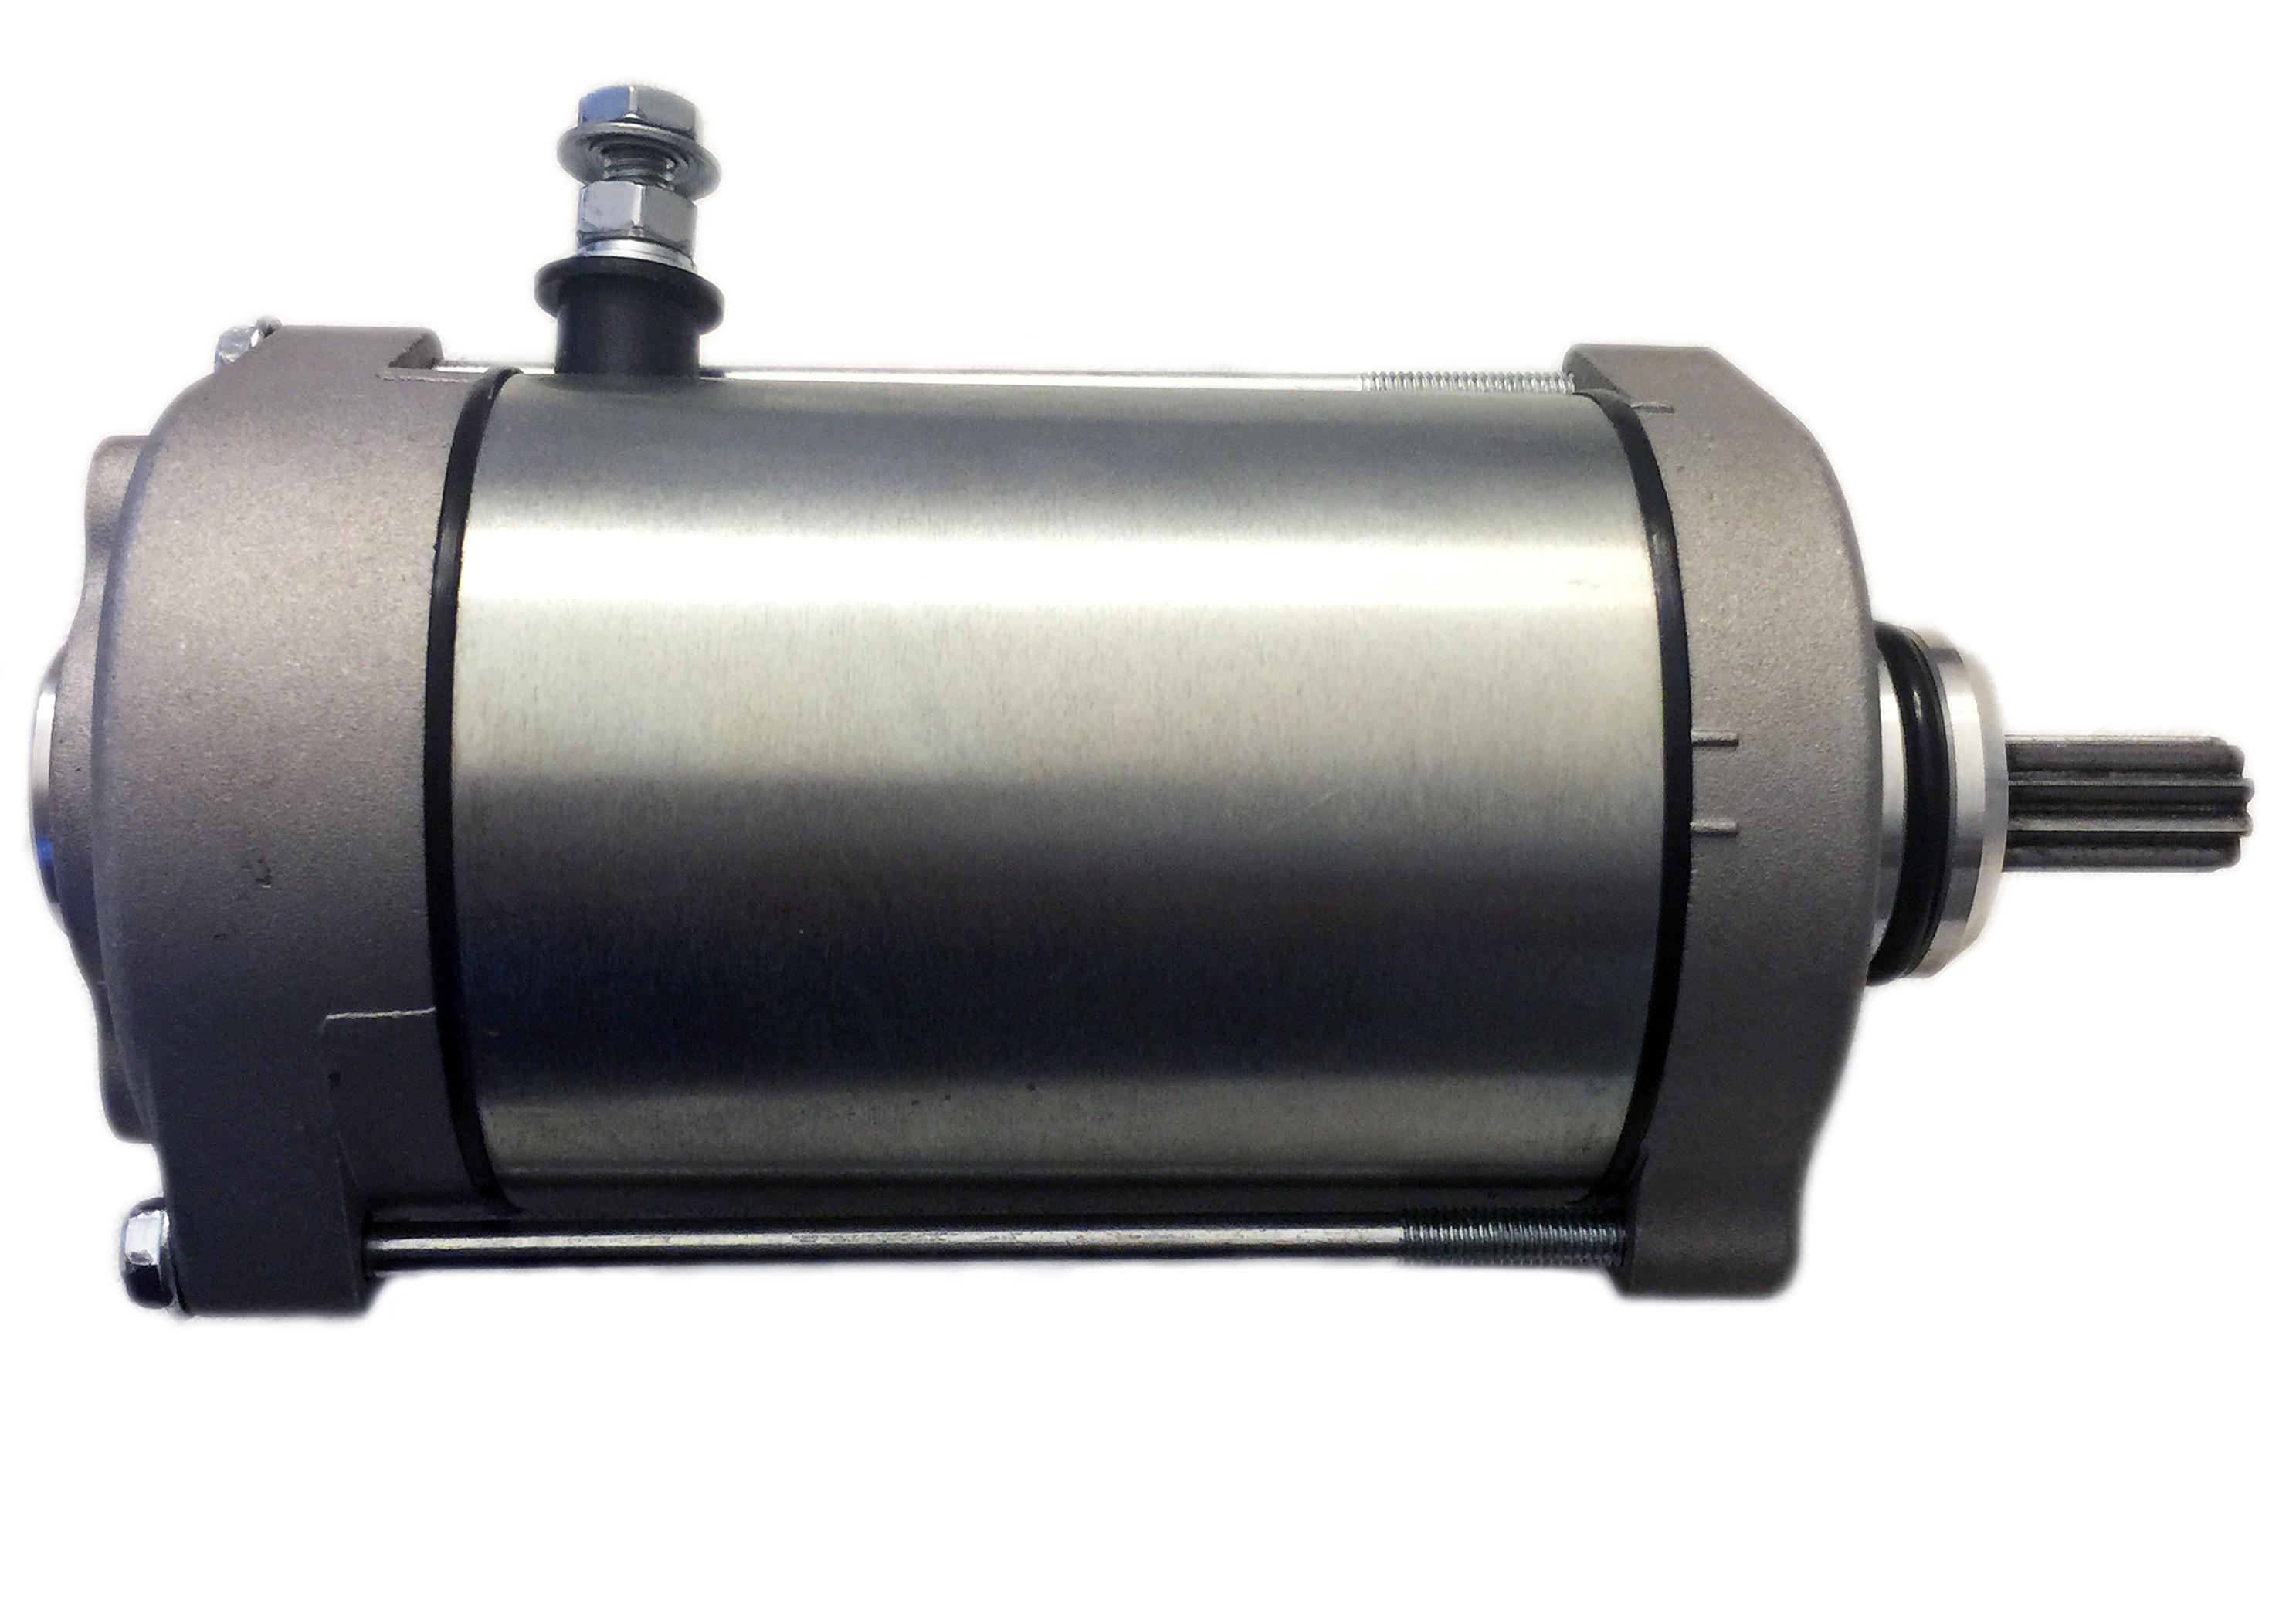 Starter For John Deere UTV Gator RSX 850i 839cc Replaces MIU13949 MIU13367